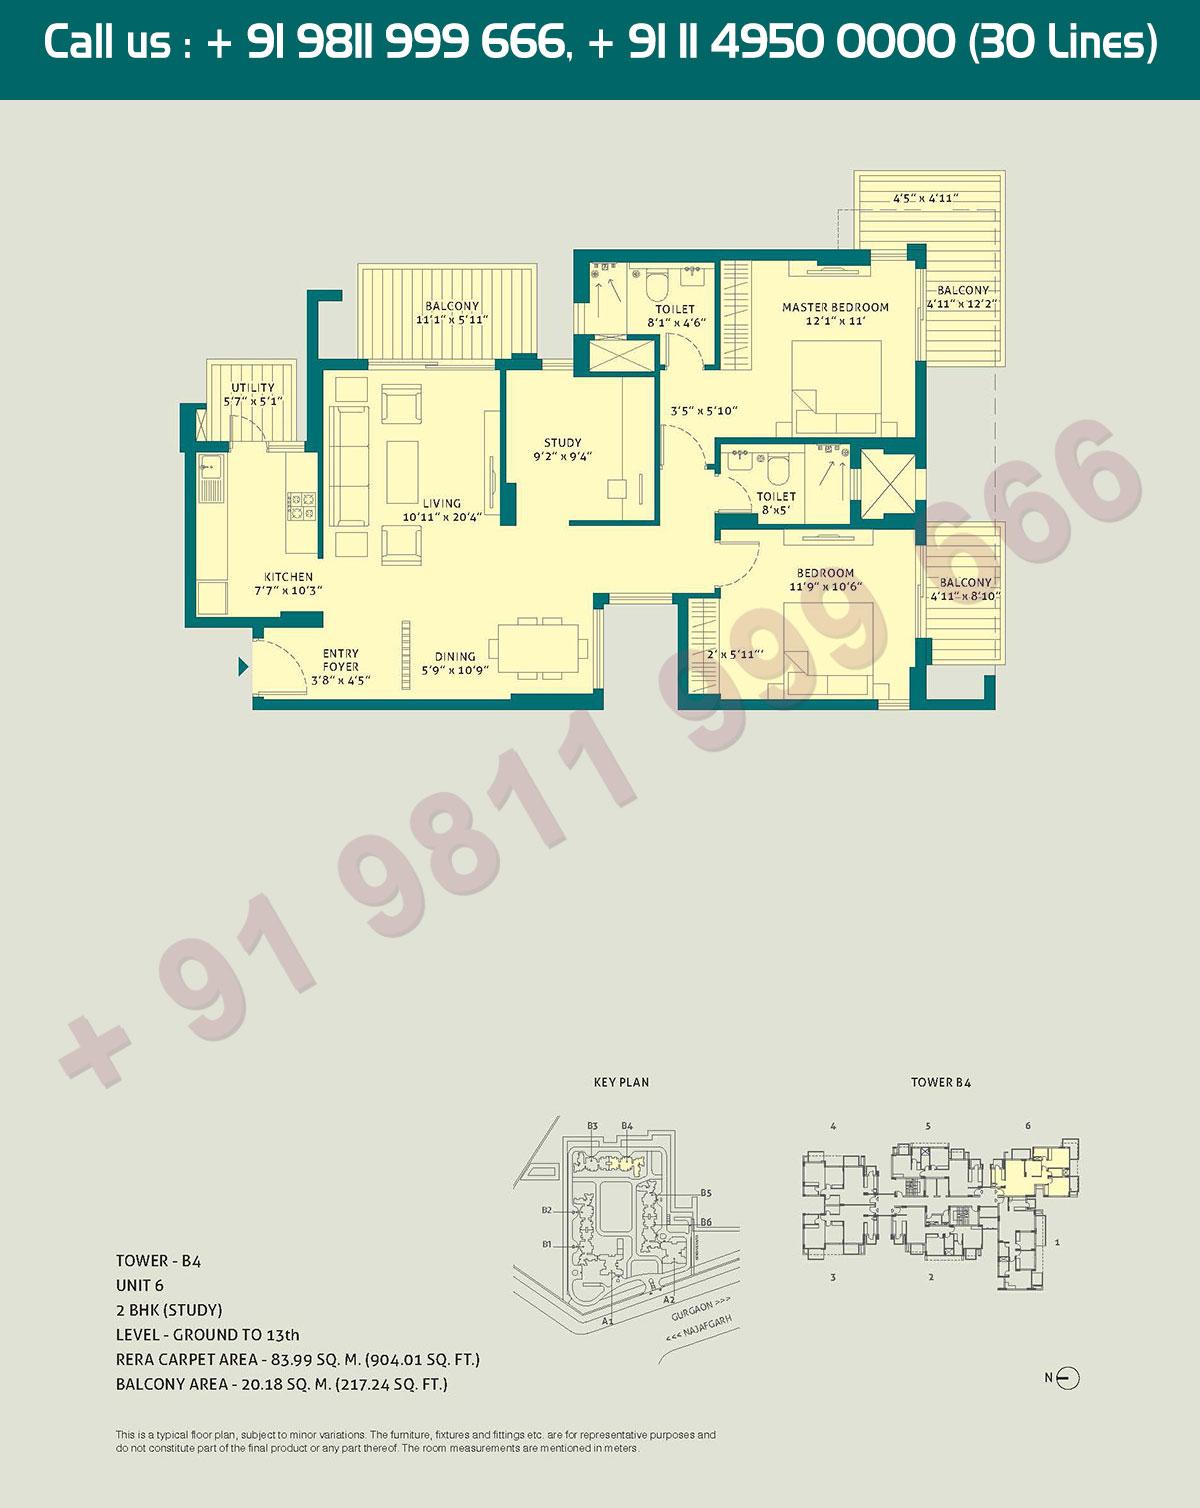 2 BHK - (Study), Level Ground to 13, Unit - 6